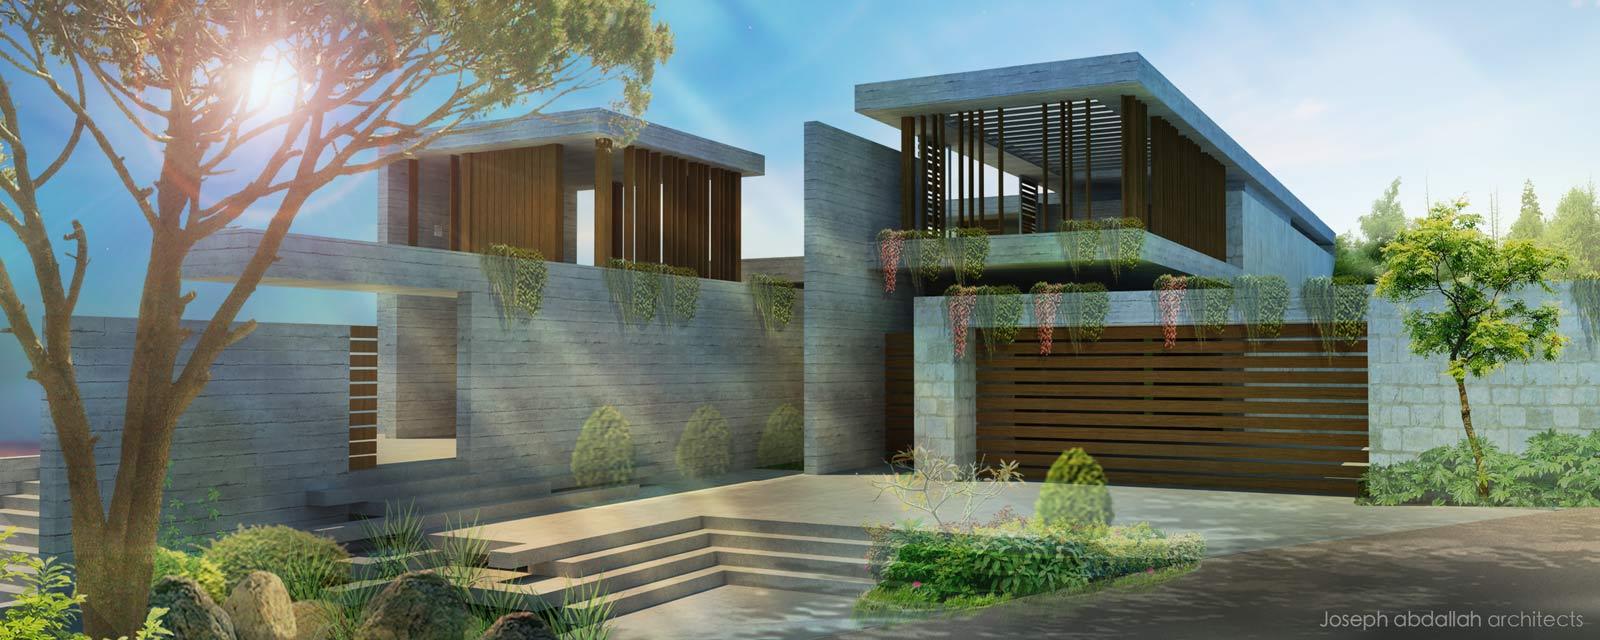 nassif-water-mirror-villa-lebanon-joseph-abdallah-architects-1